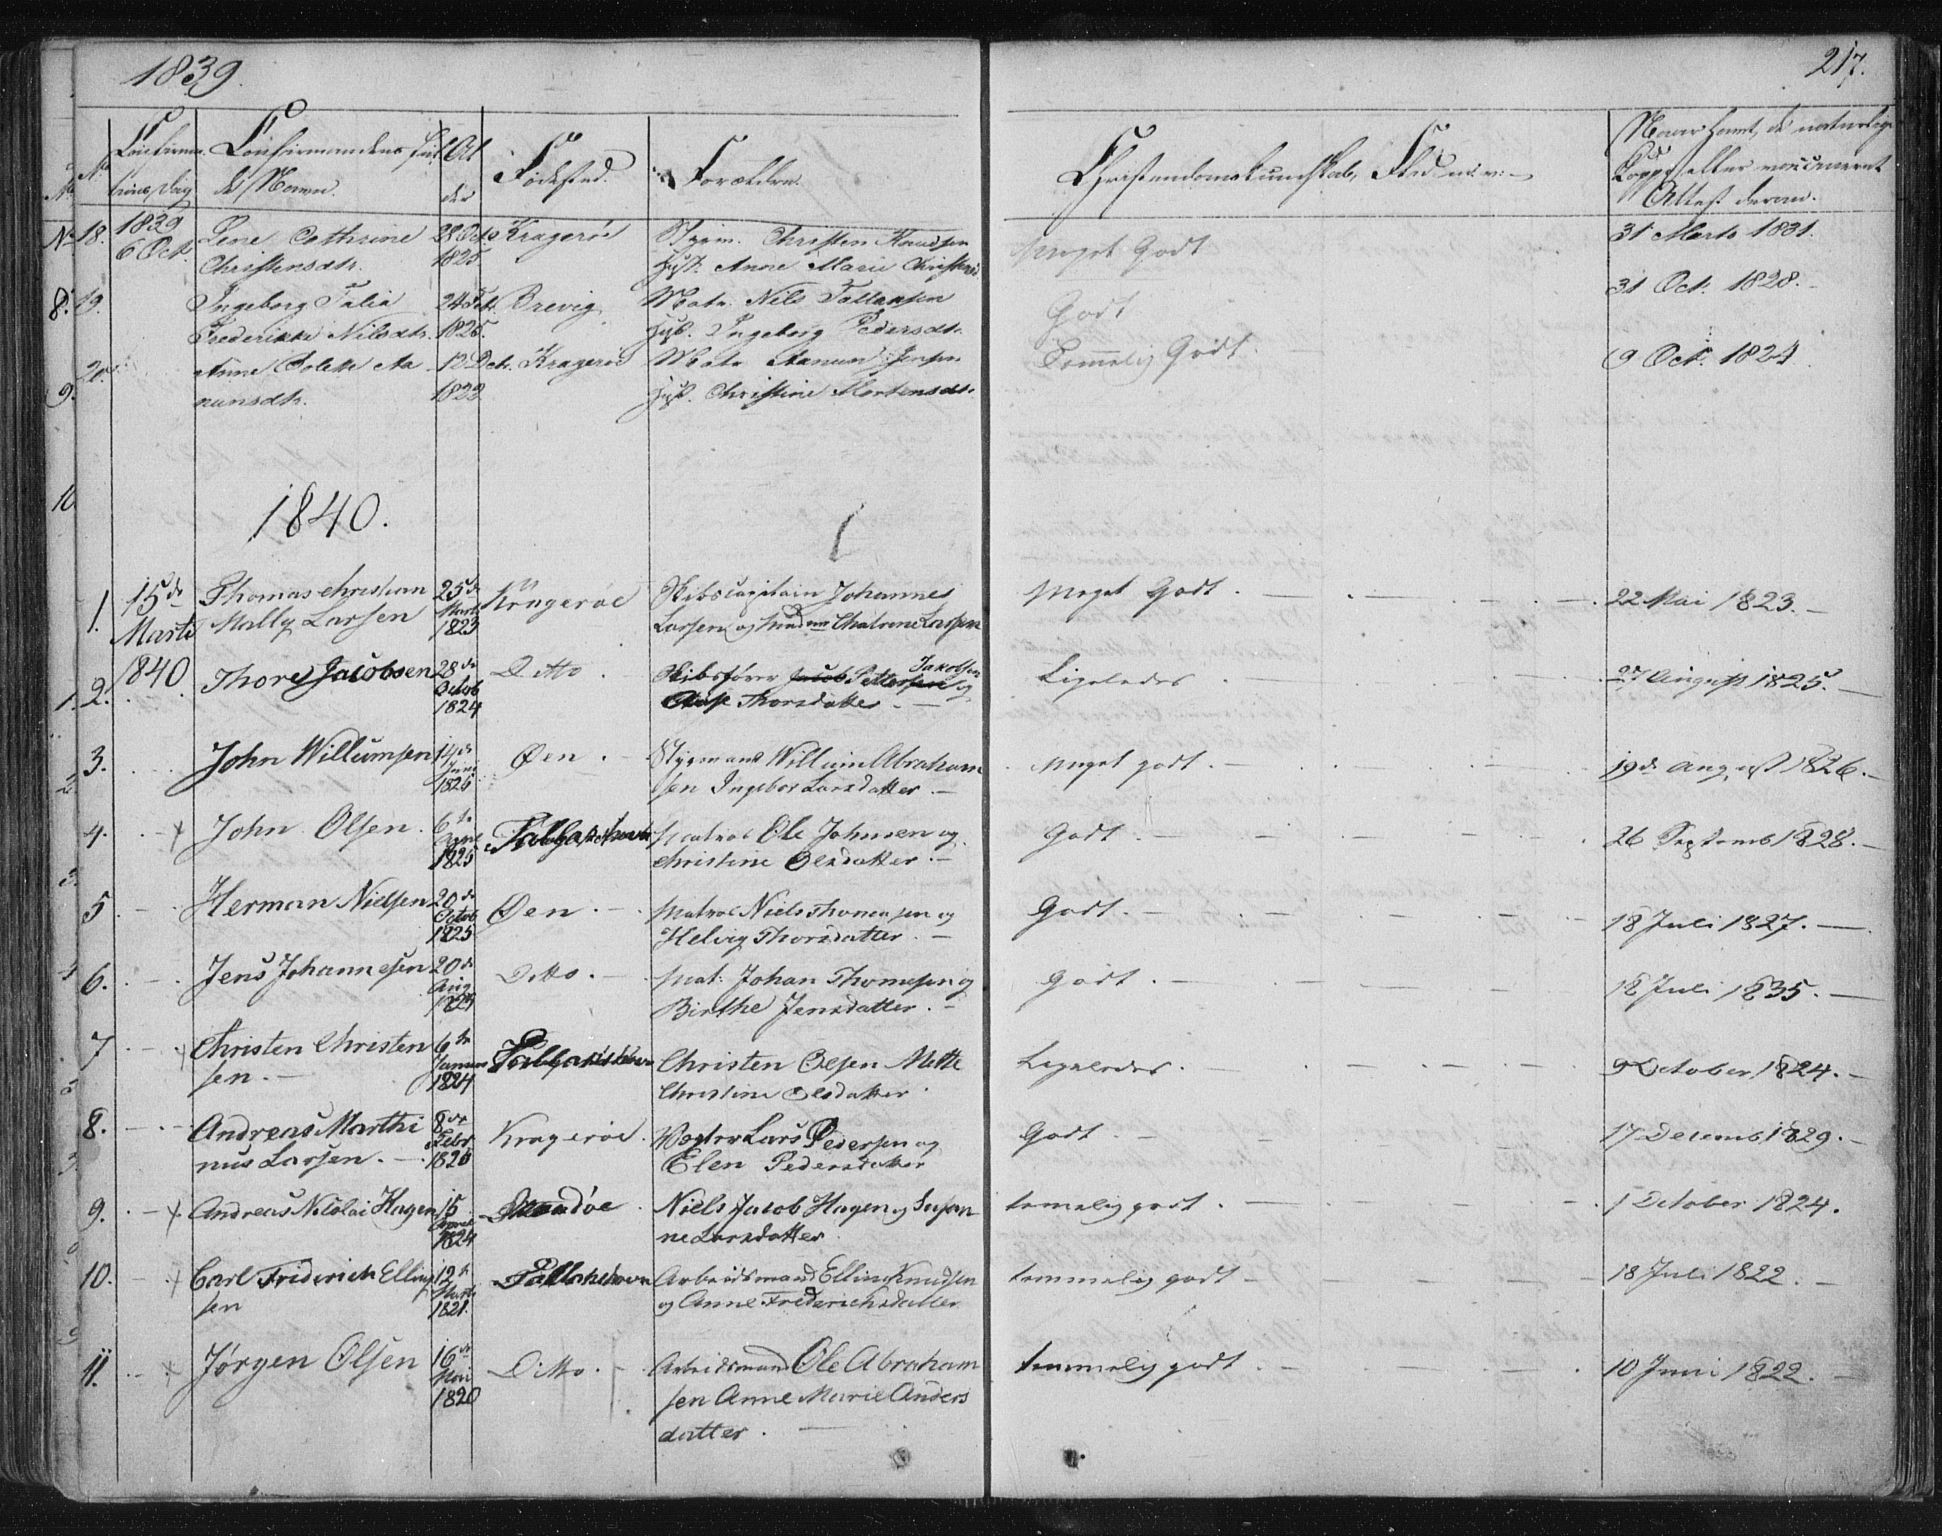 SAKO, Kragerø kirkebøker, F/Fa/L0005: Ministerialbok nr. 5, 1832-1847, s. 217